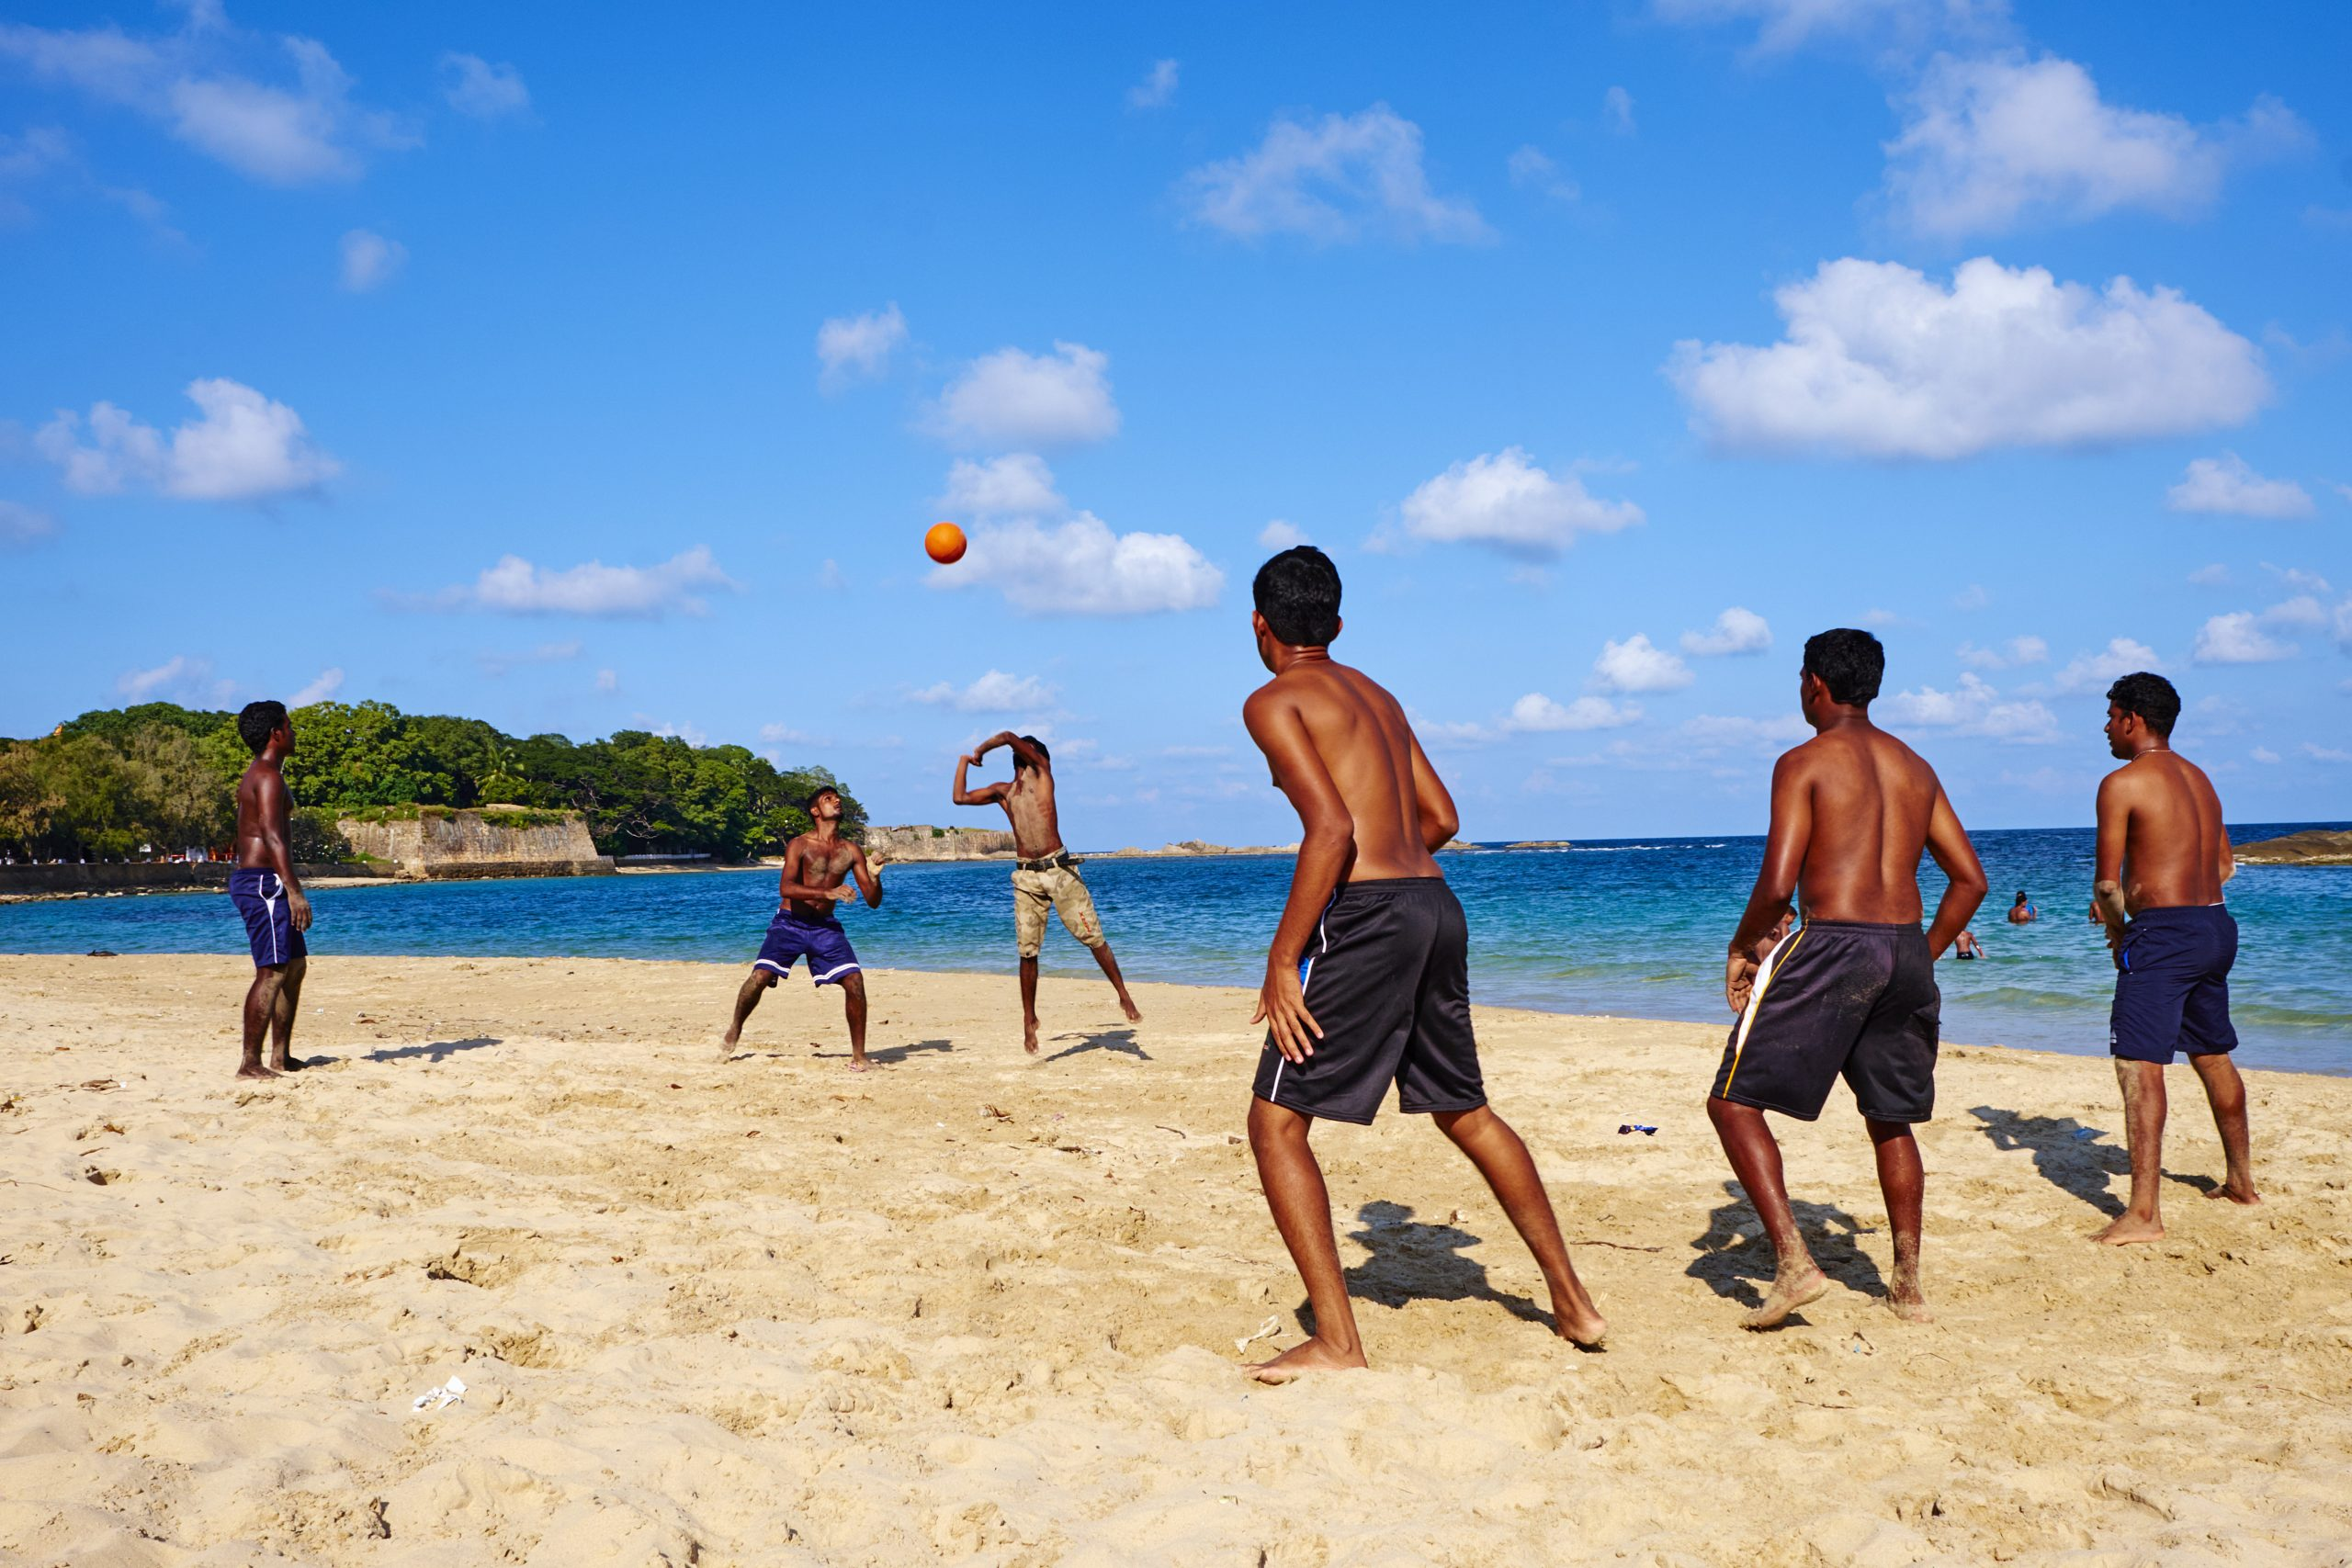 Sri Lanka, Trincomalee, beach volley